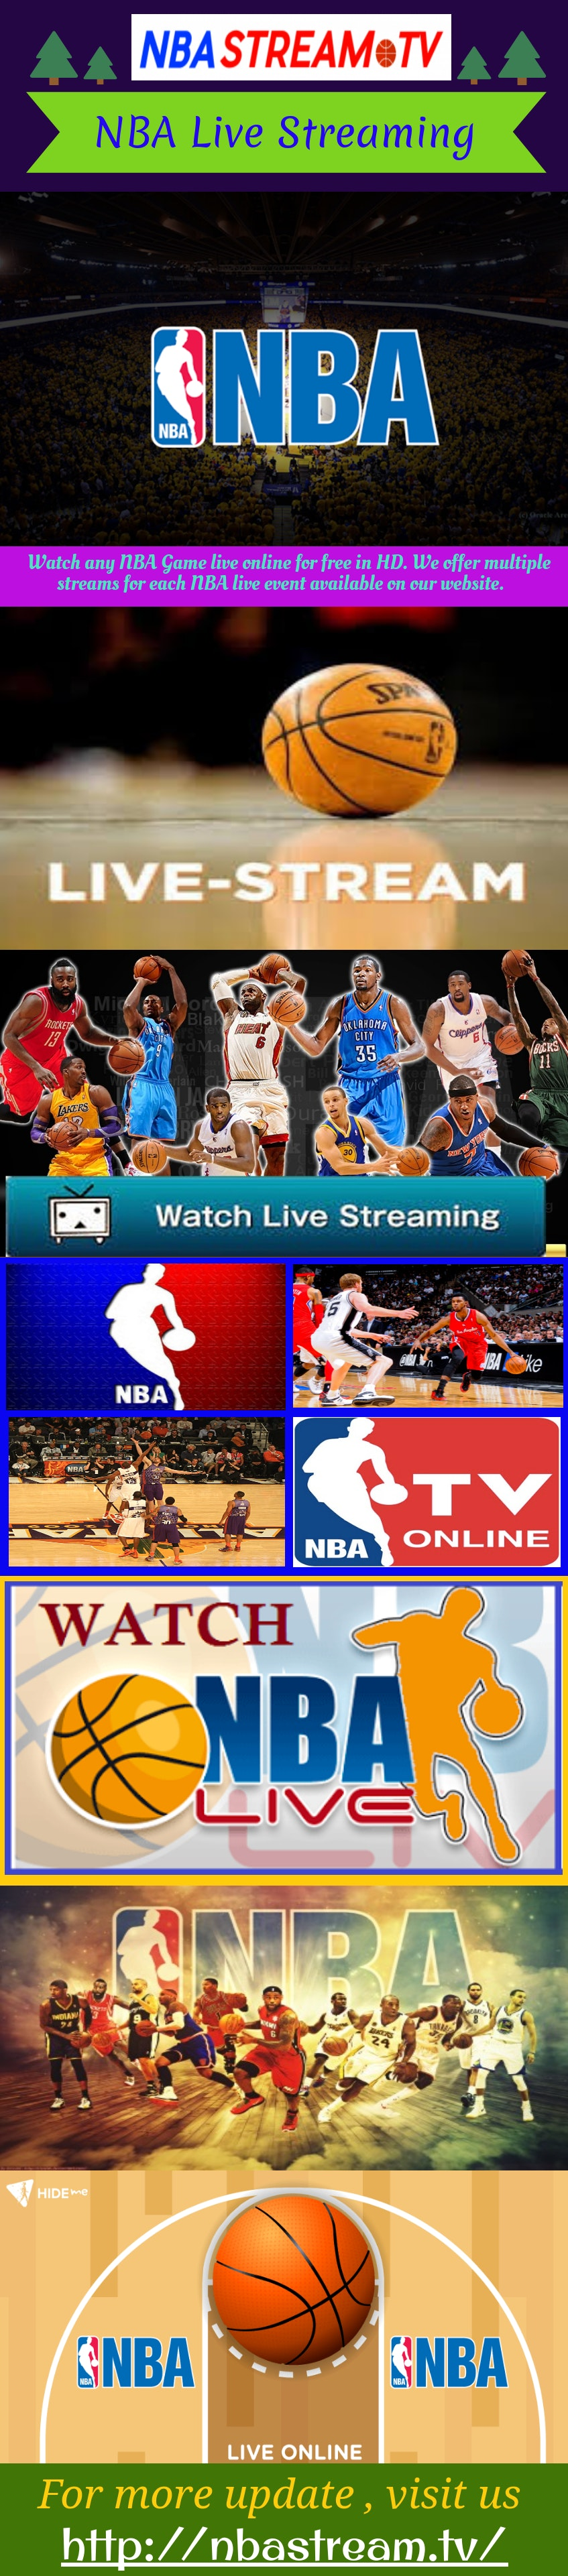 free stock photo of nba live stream nba stream nba streaming